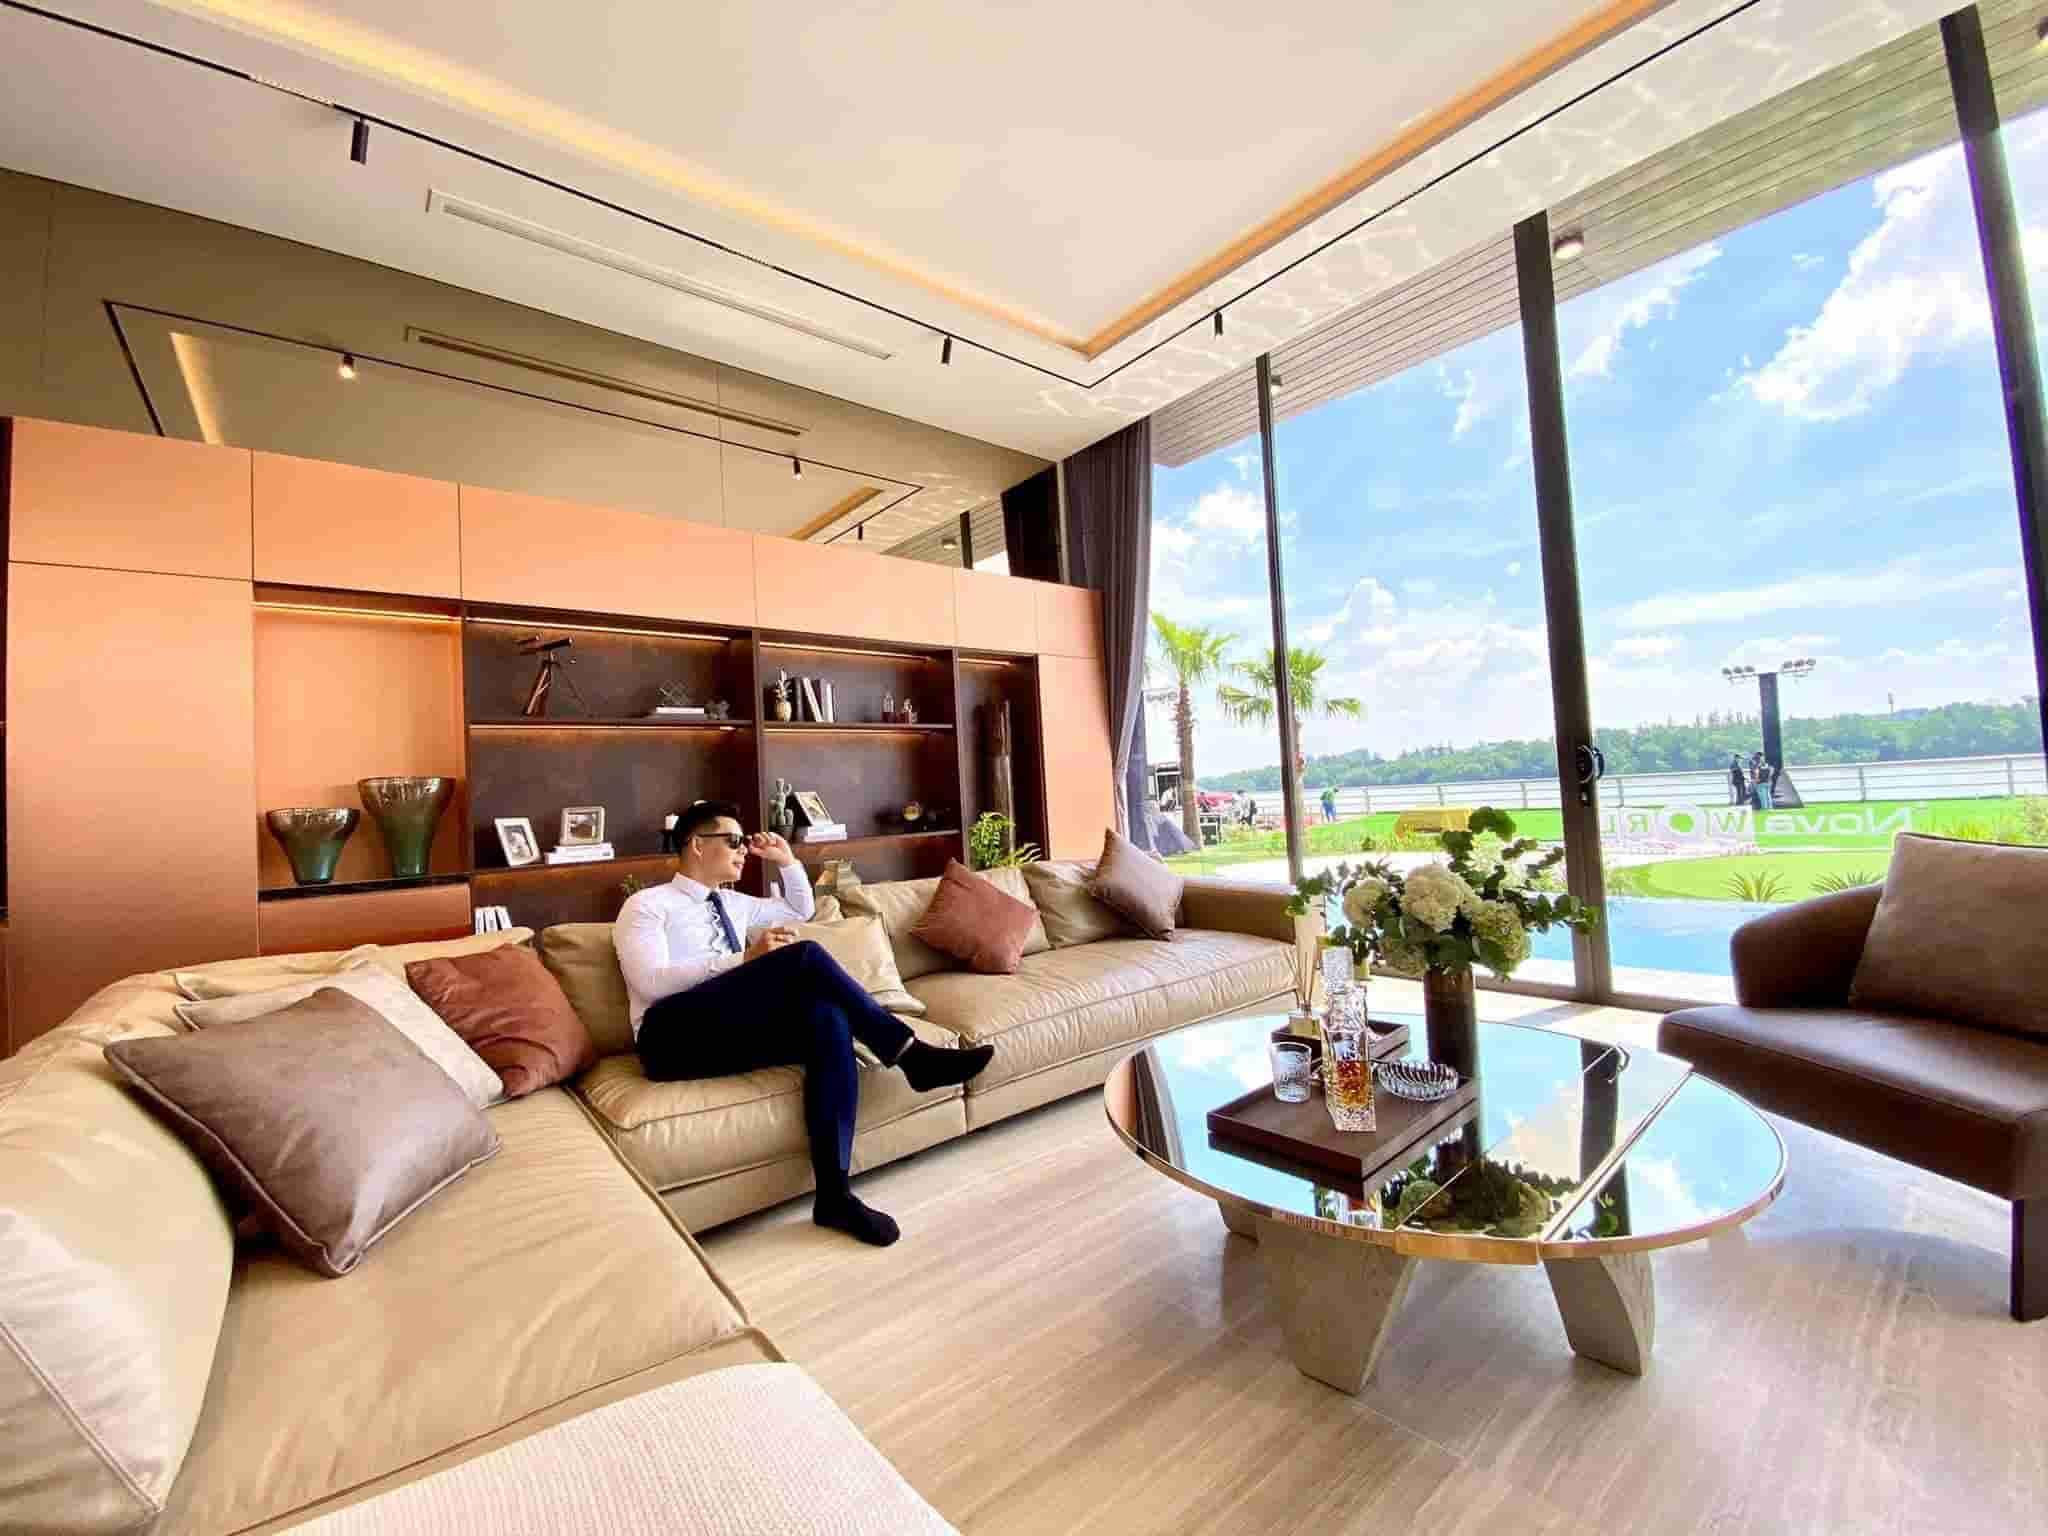 Biệt thự mẫu pga golf villas